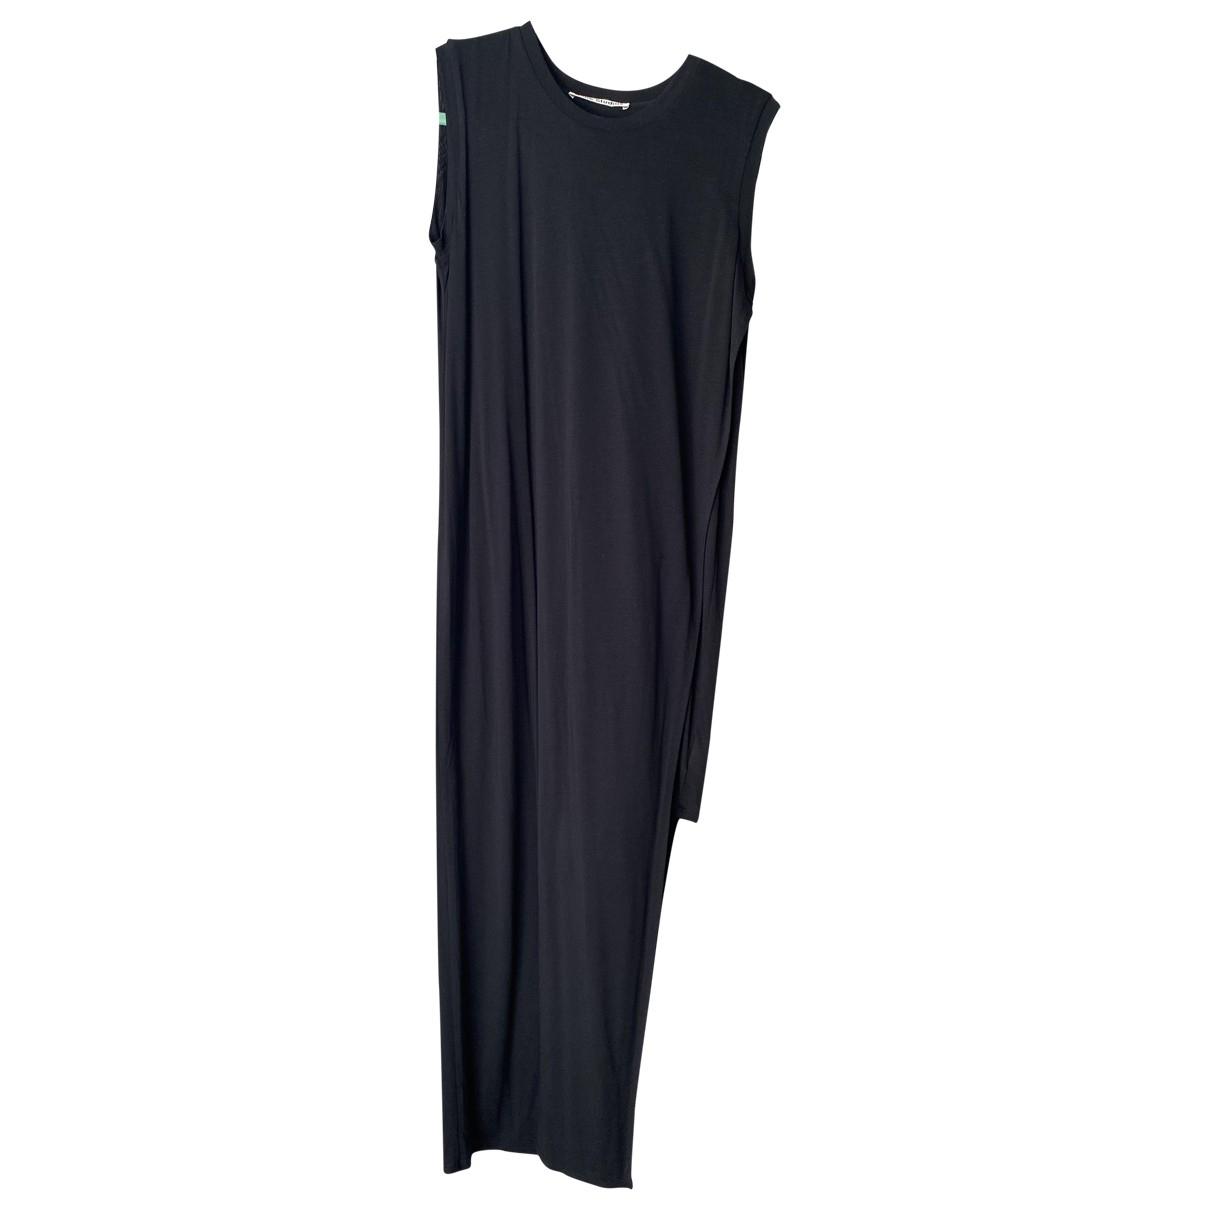 Acne Studios N Black Cotton dress for Women XXS International